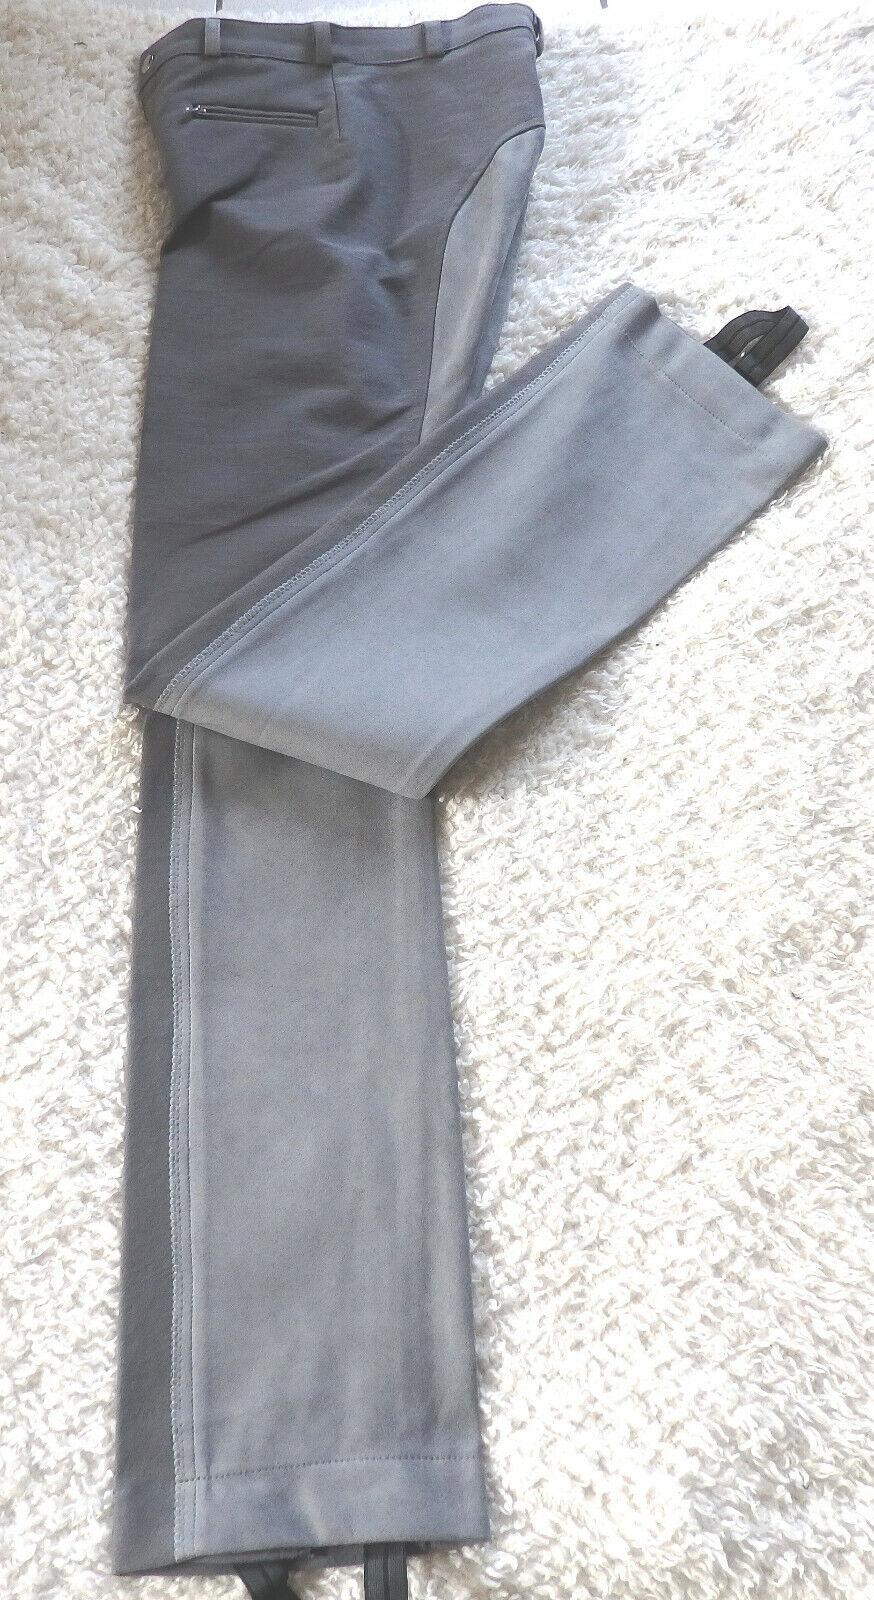 ldren's Jodhpur Riding Pants Grey, FULL TRIM,  SIZE 176, (353)  sale with high discount